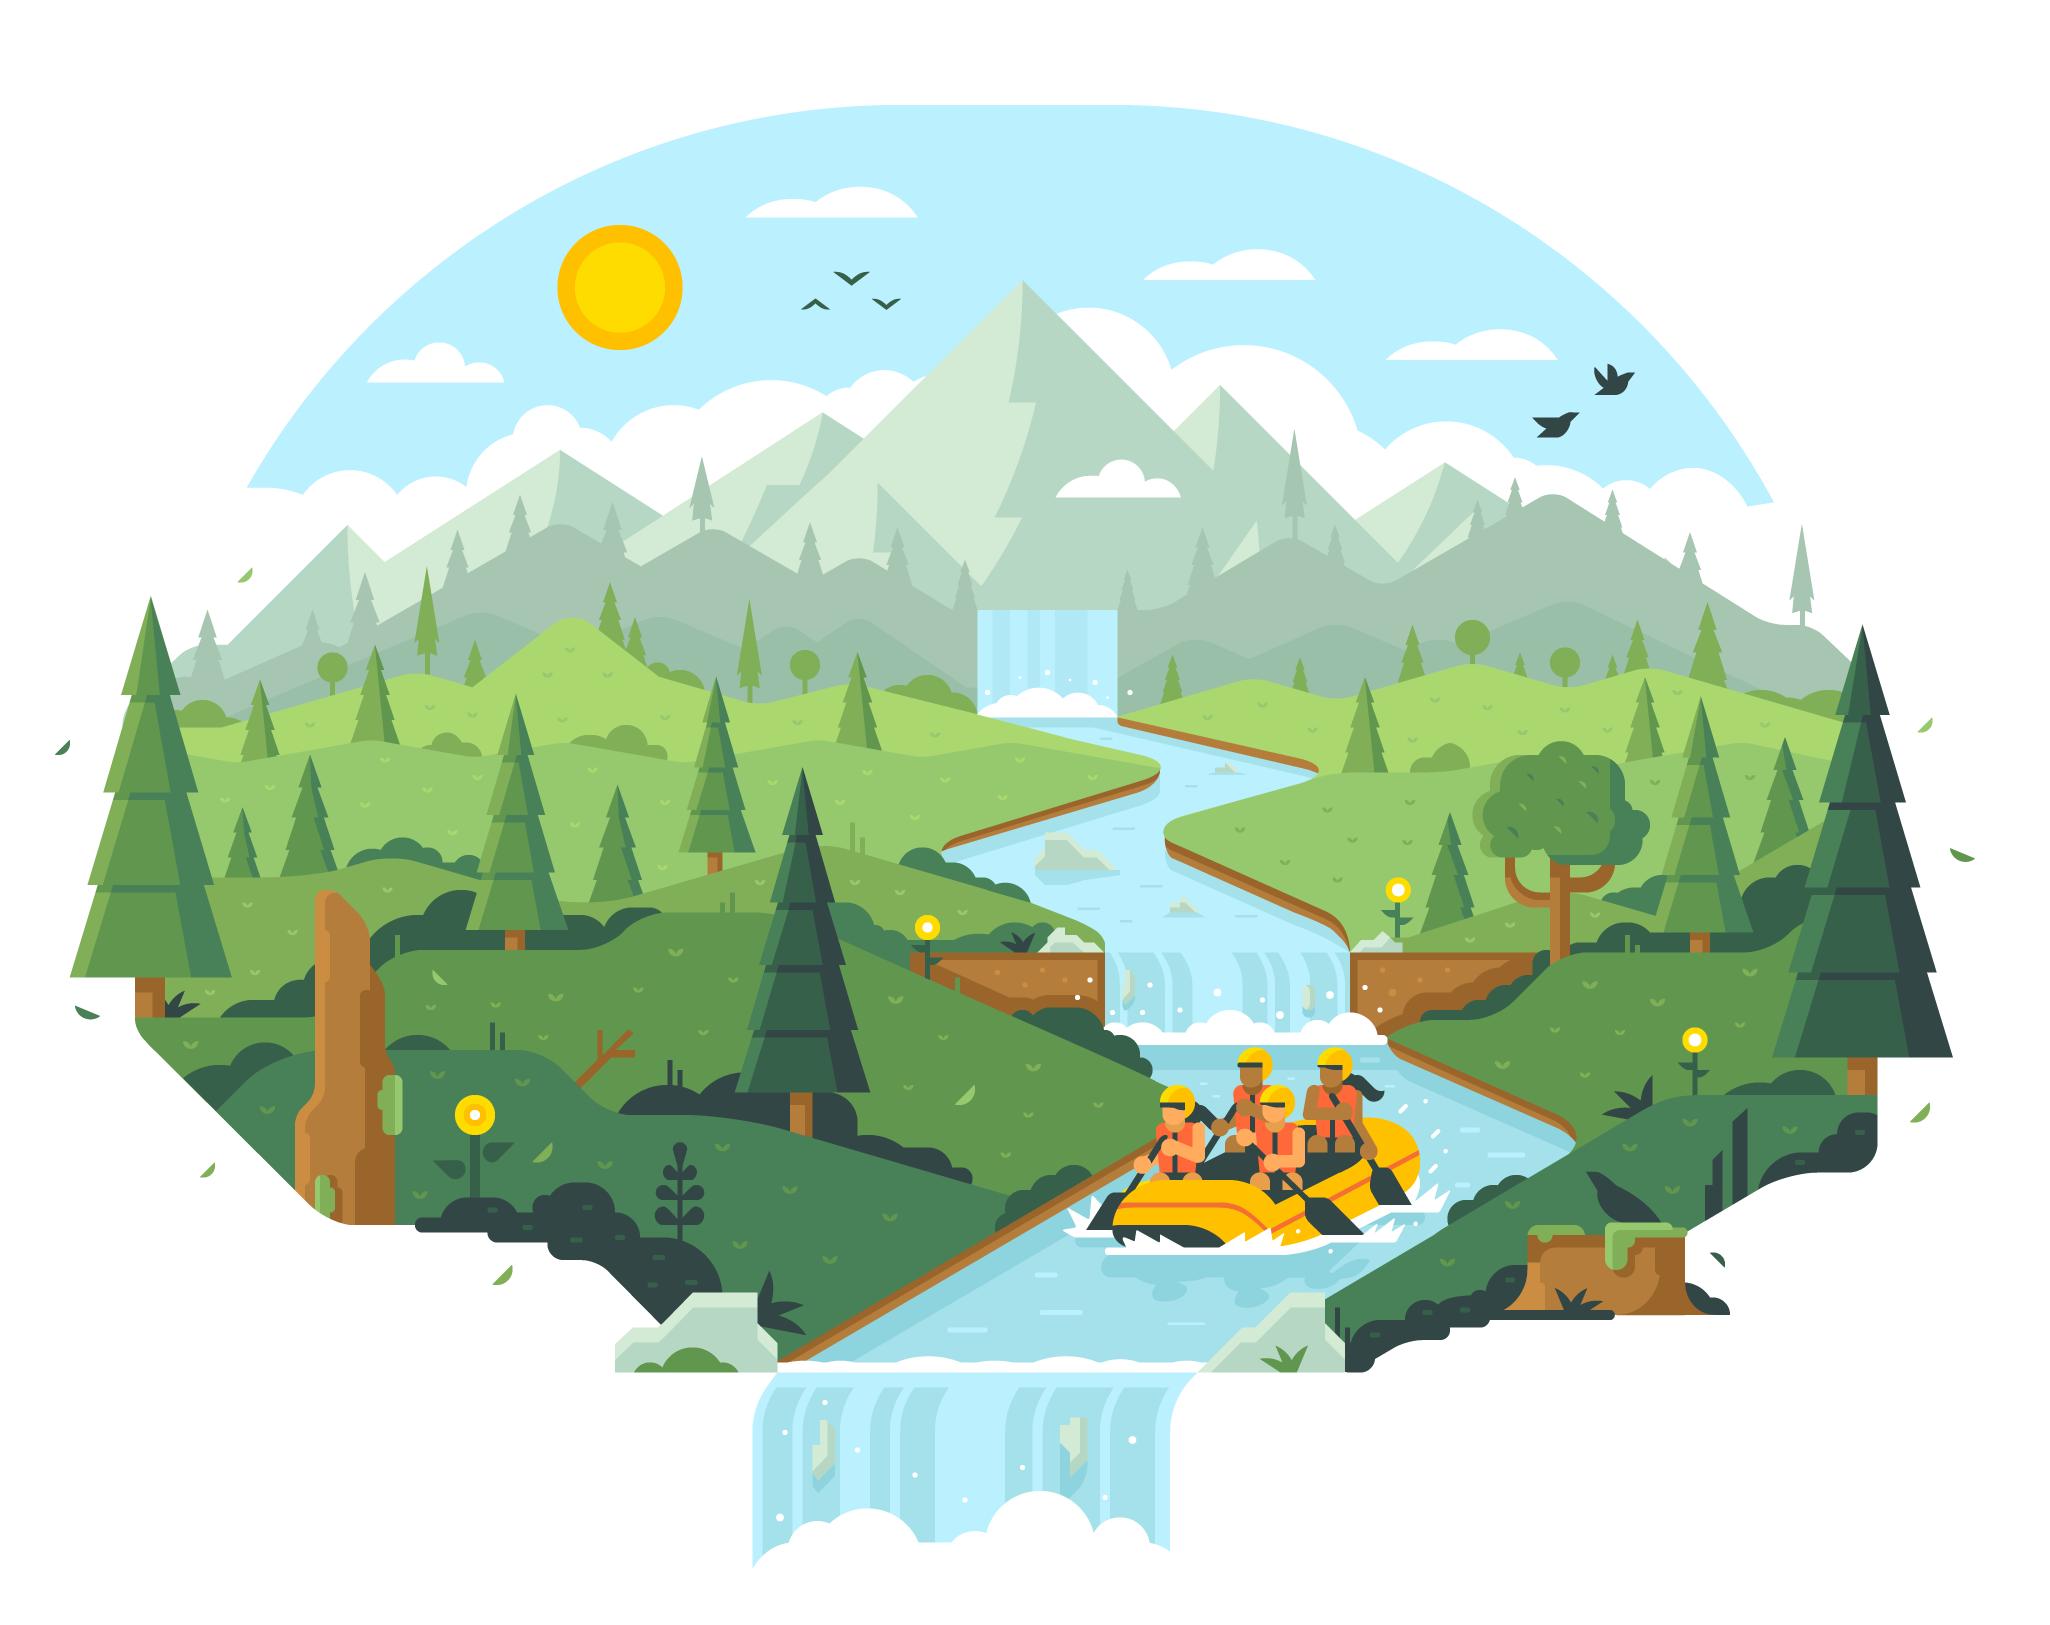 CSS Healthcare Website Illustrations by Matt Anderson - White Water Rafting Hero Illustration